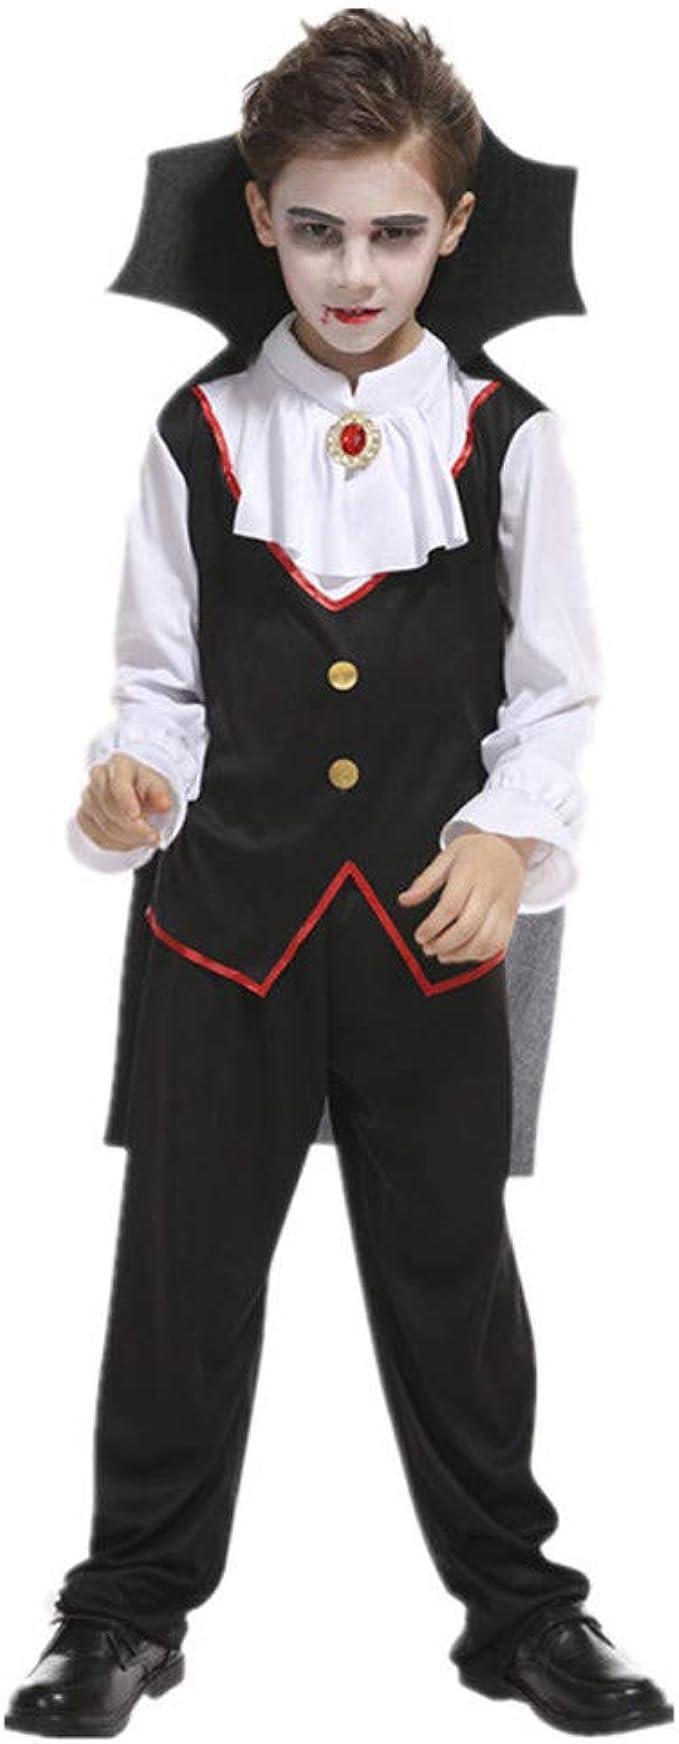 Halloween 3er Kostuem.3er Halloween Cosplay Kostum Mantel Outfits Set Tops Pants Umhang Black 10jahre Amazon De Bekleidung